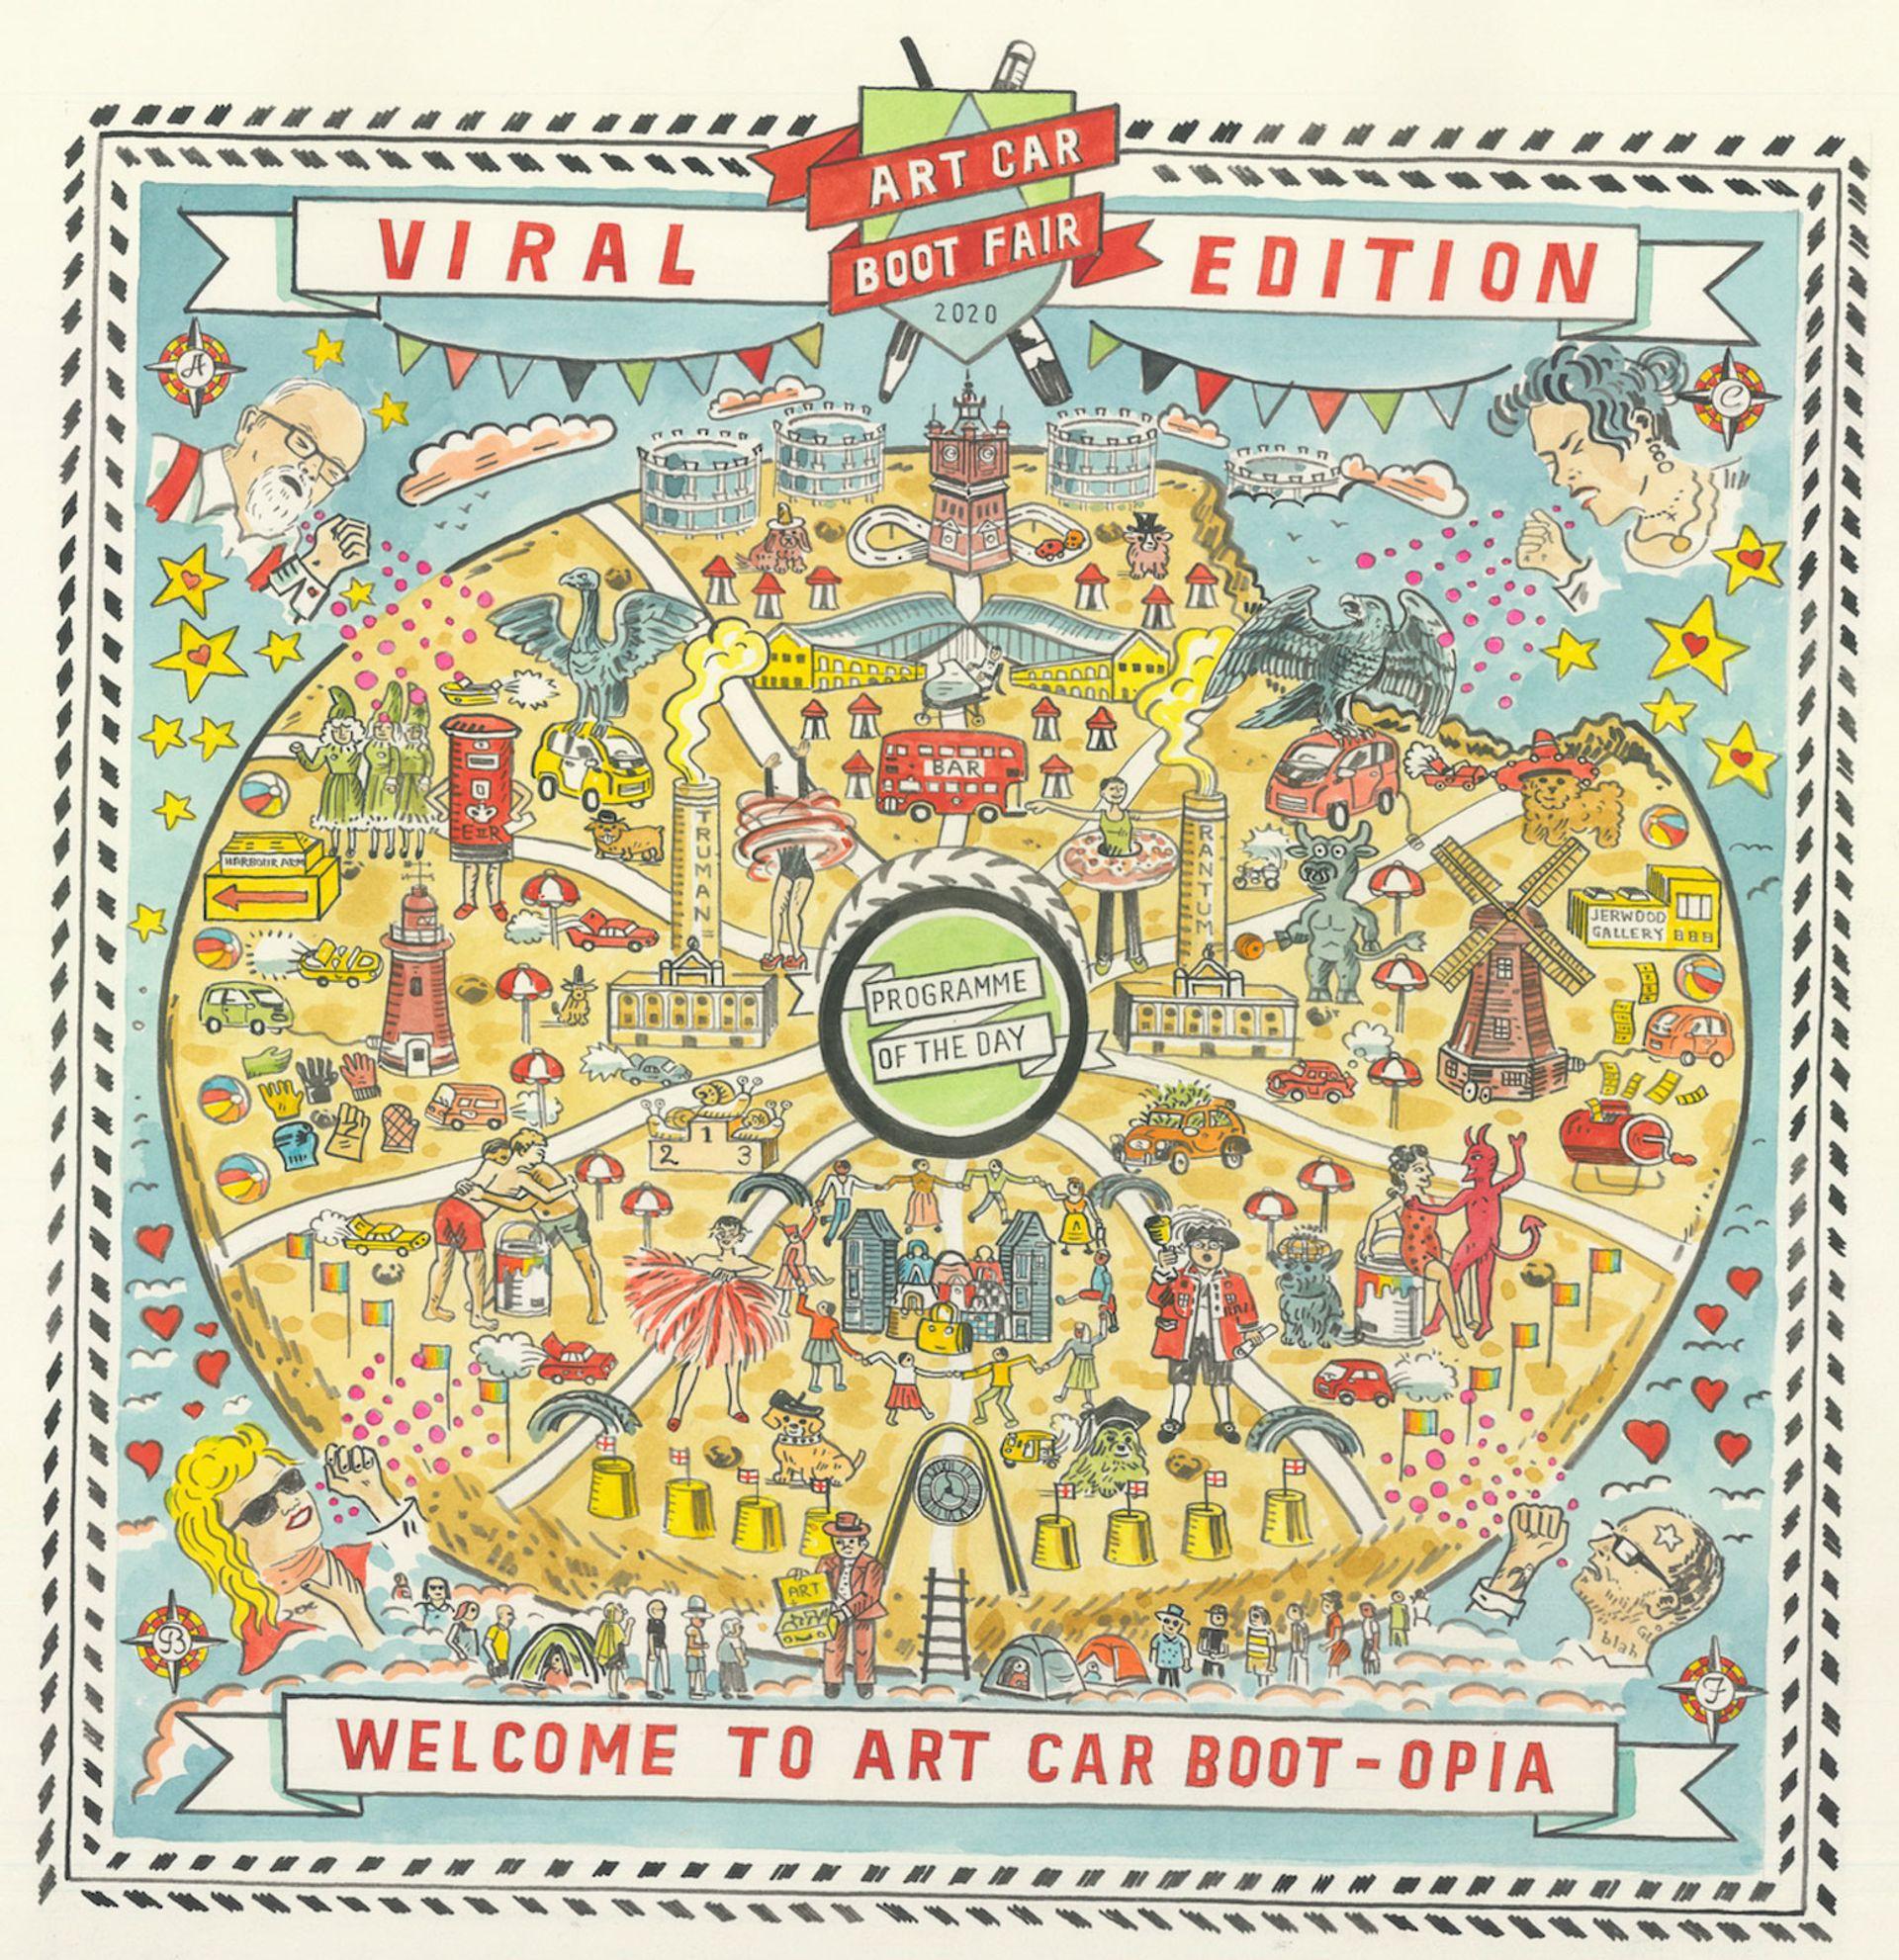 Adam Dant's Art Car Bootopia (2020) Courtesy of the Art Car Boot Fair